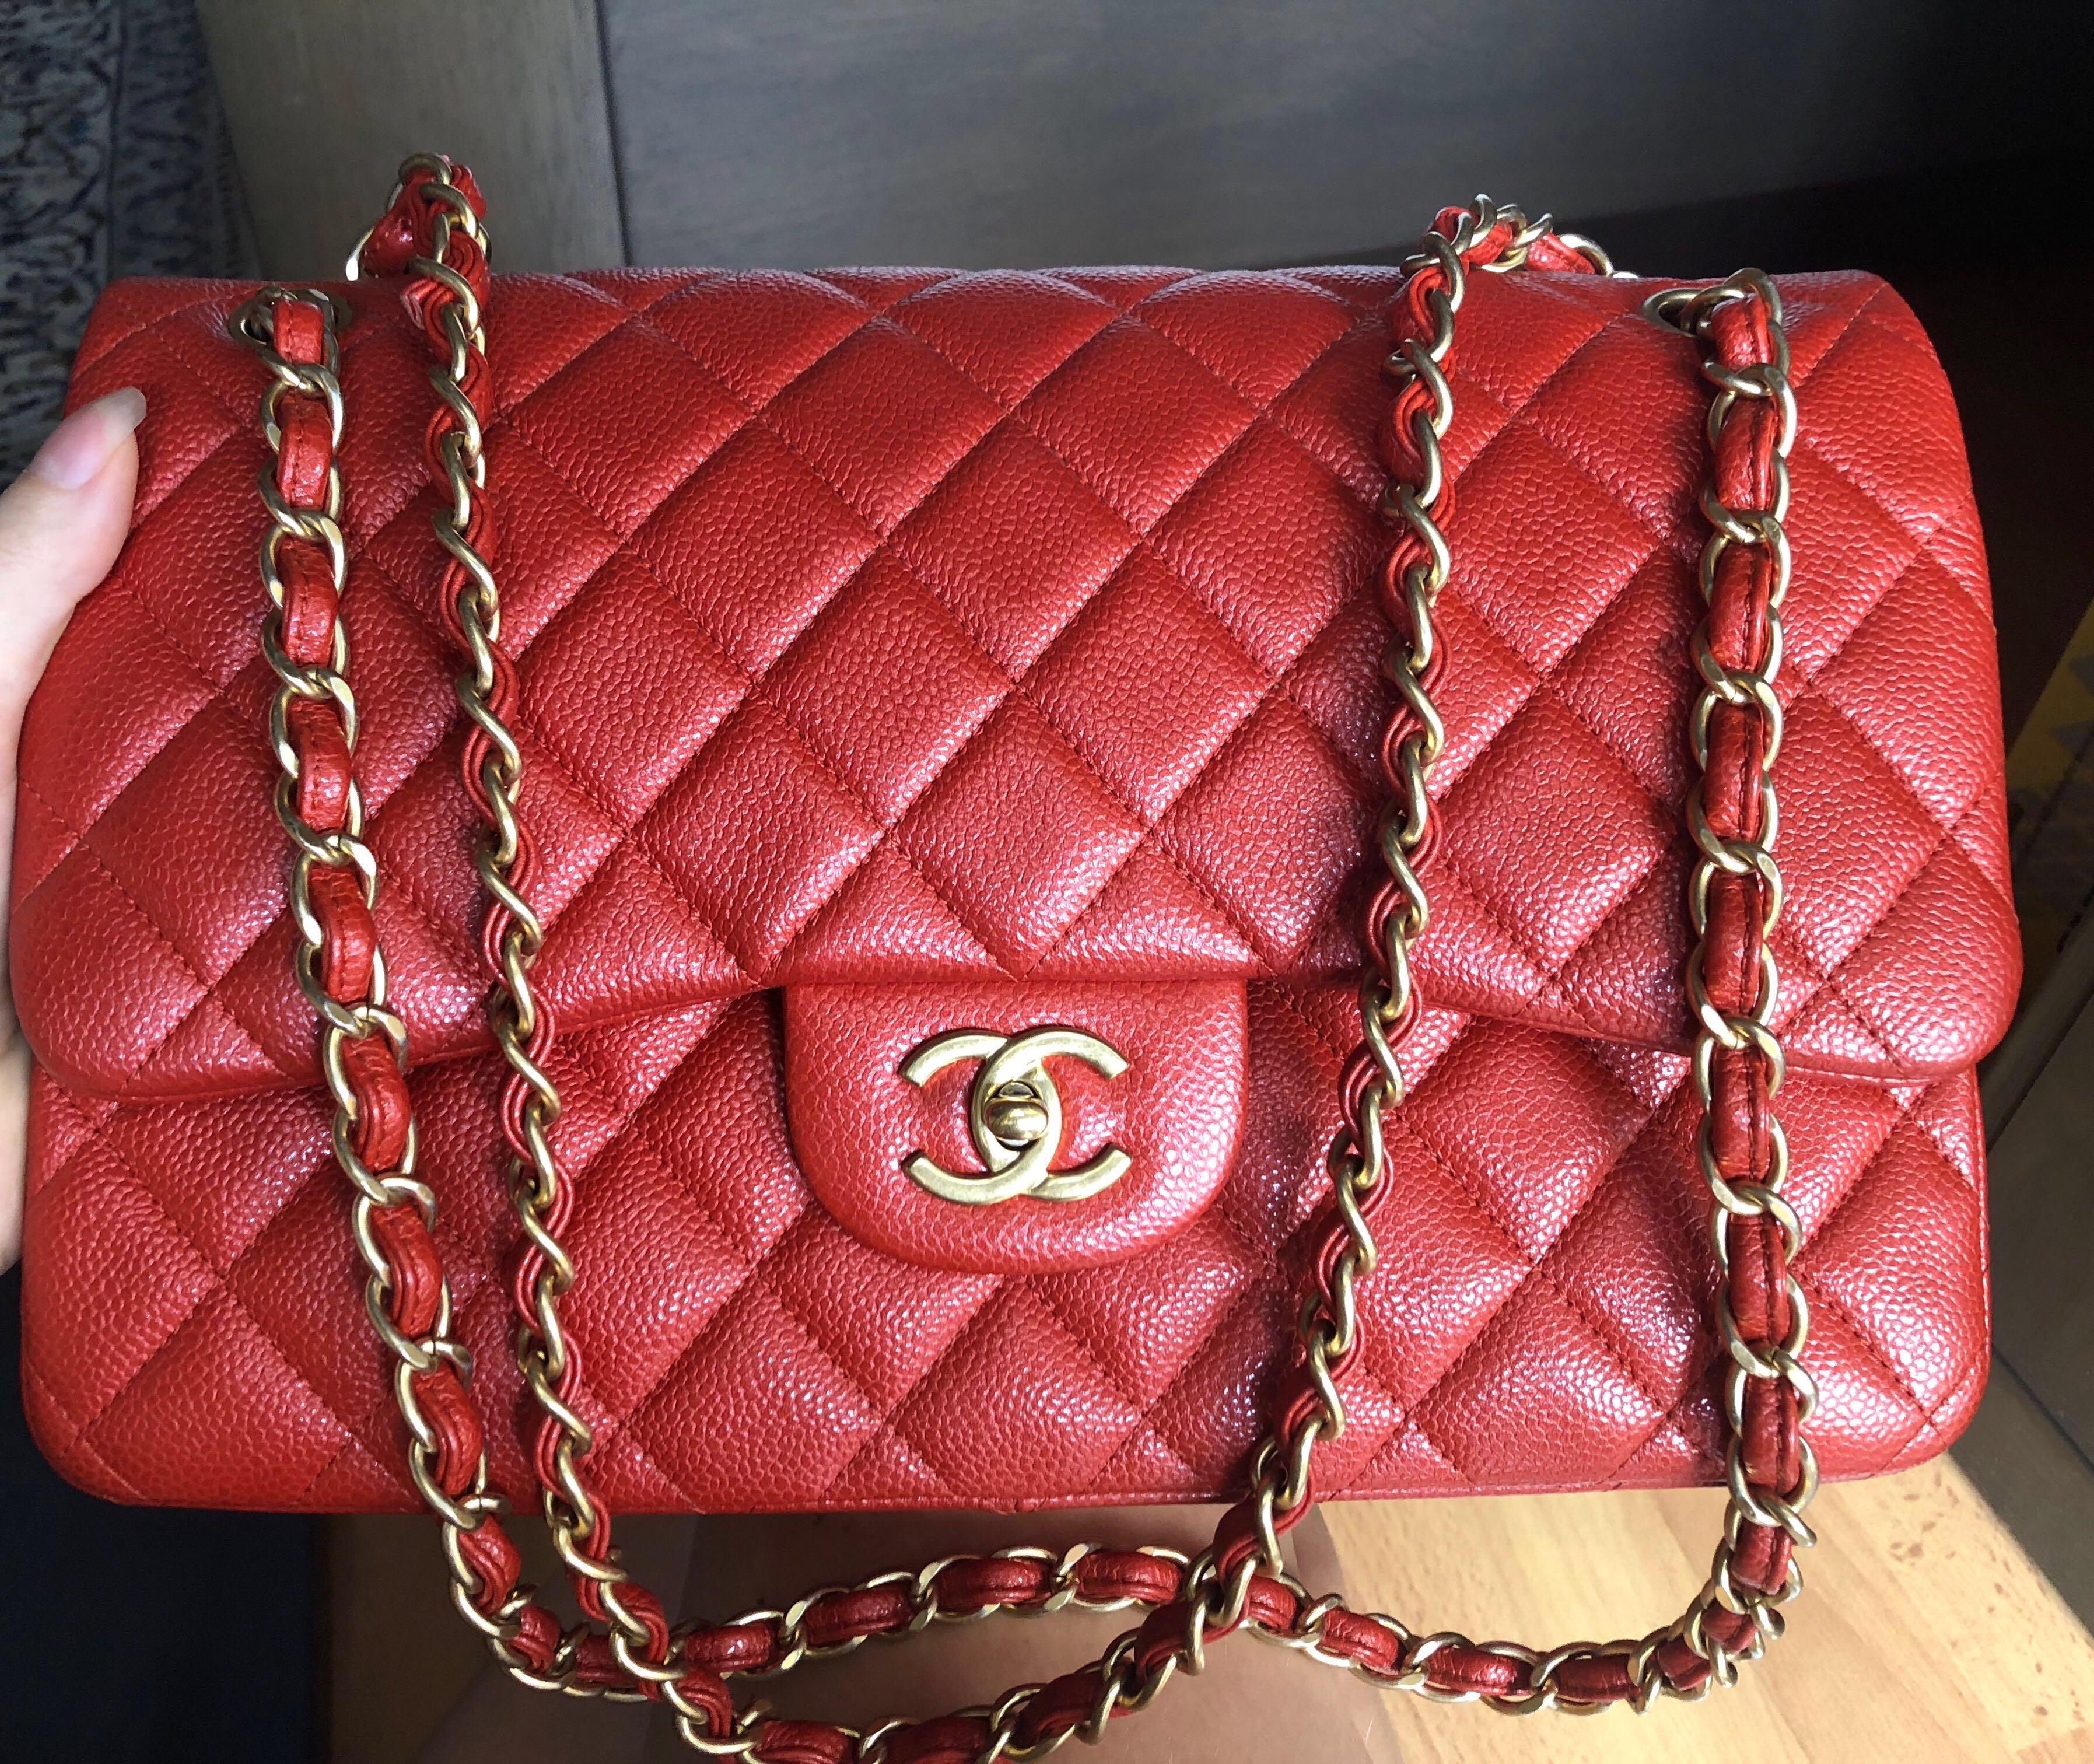 4eeed889cf21 Chanel jumbo red caviar with ghw, Luxury, Bags & Wallets, Handbags on  Carousell